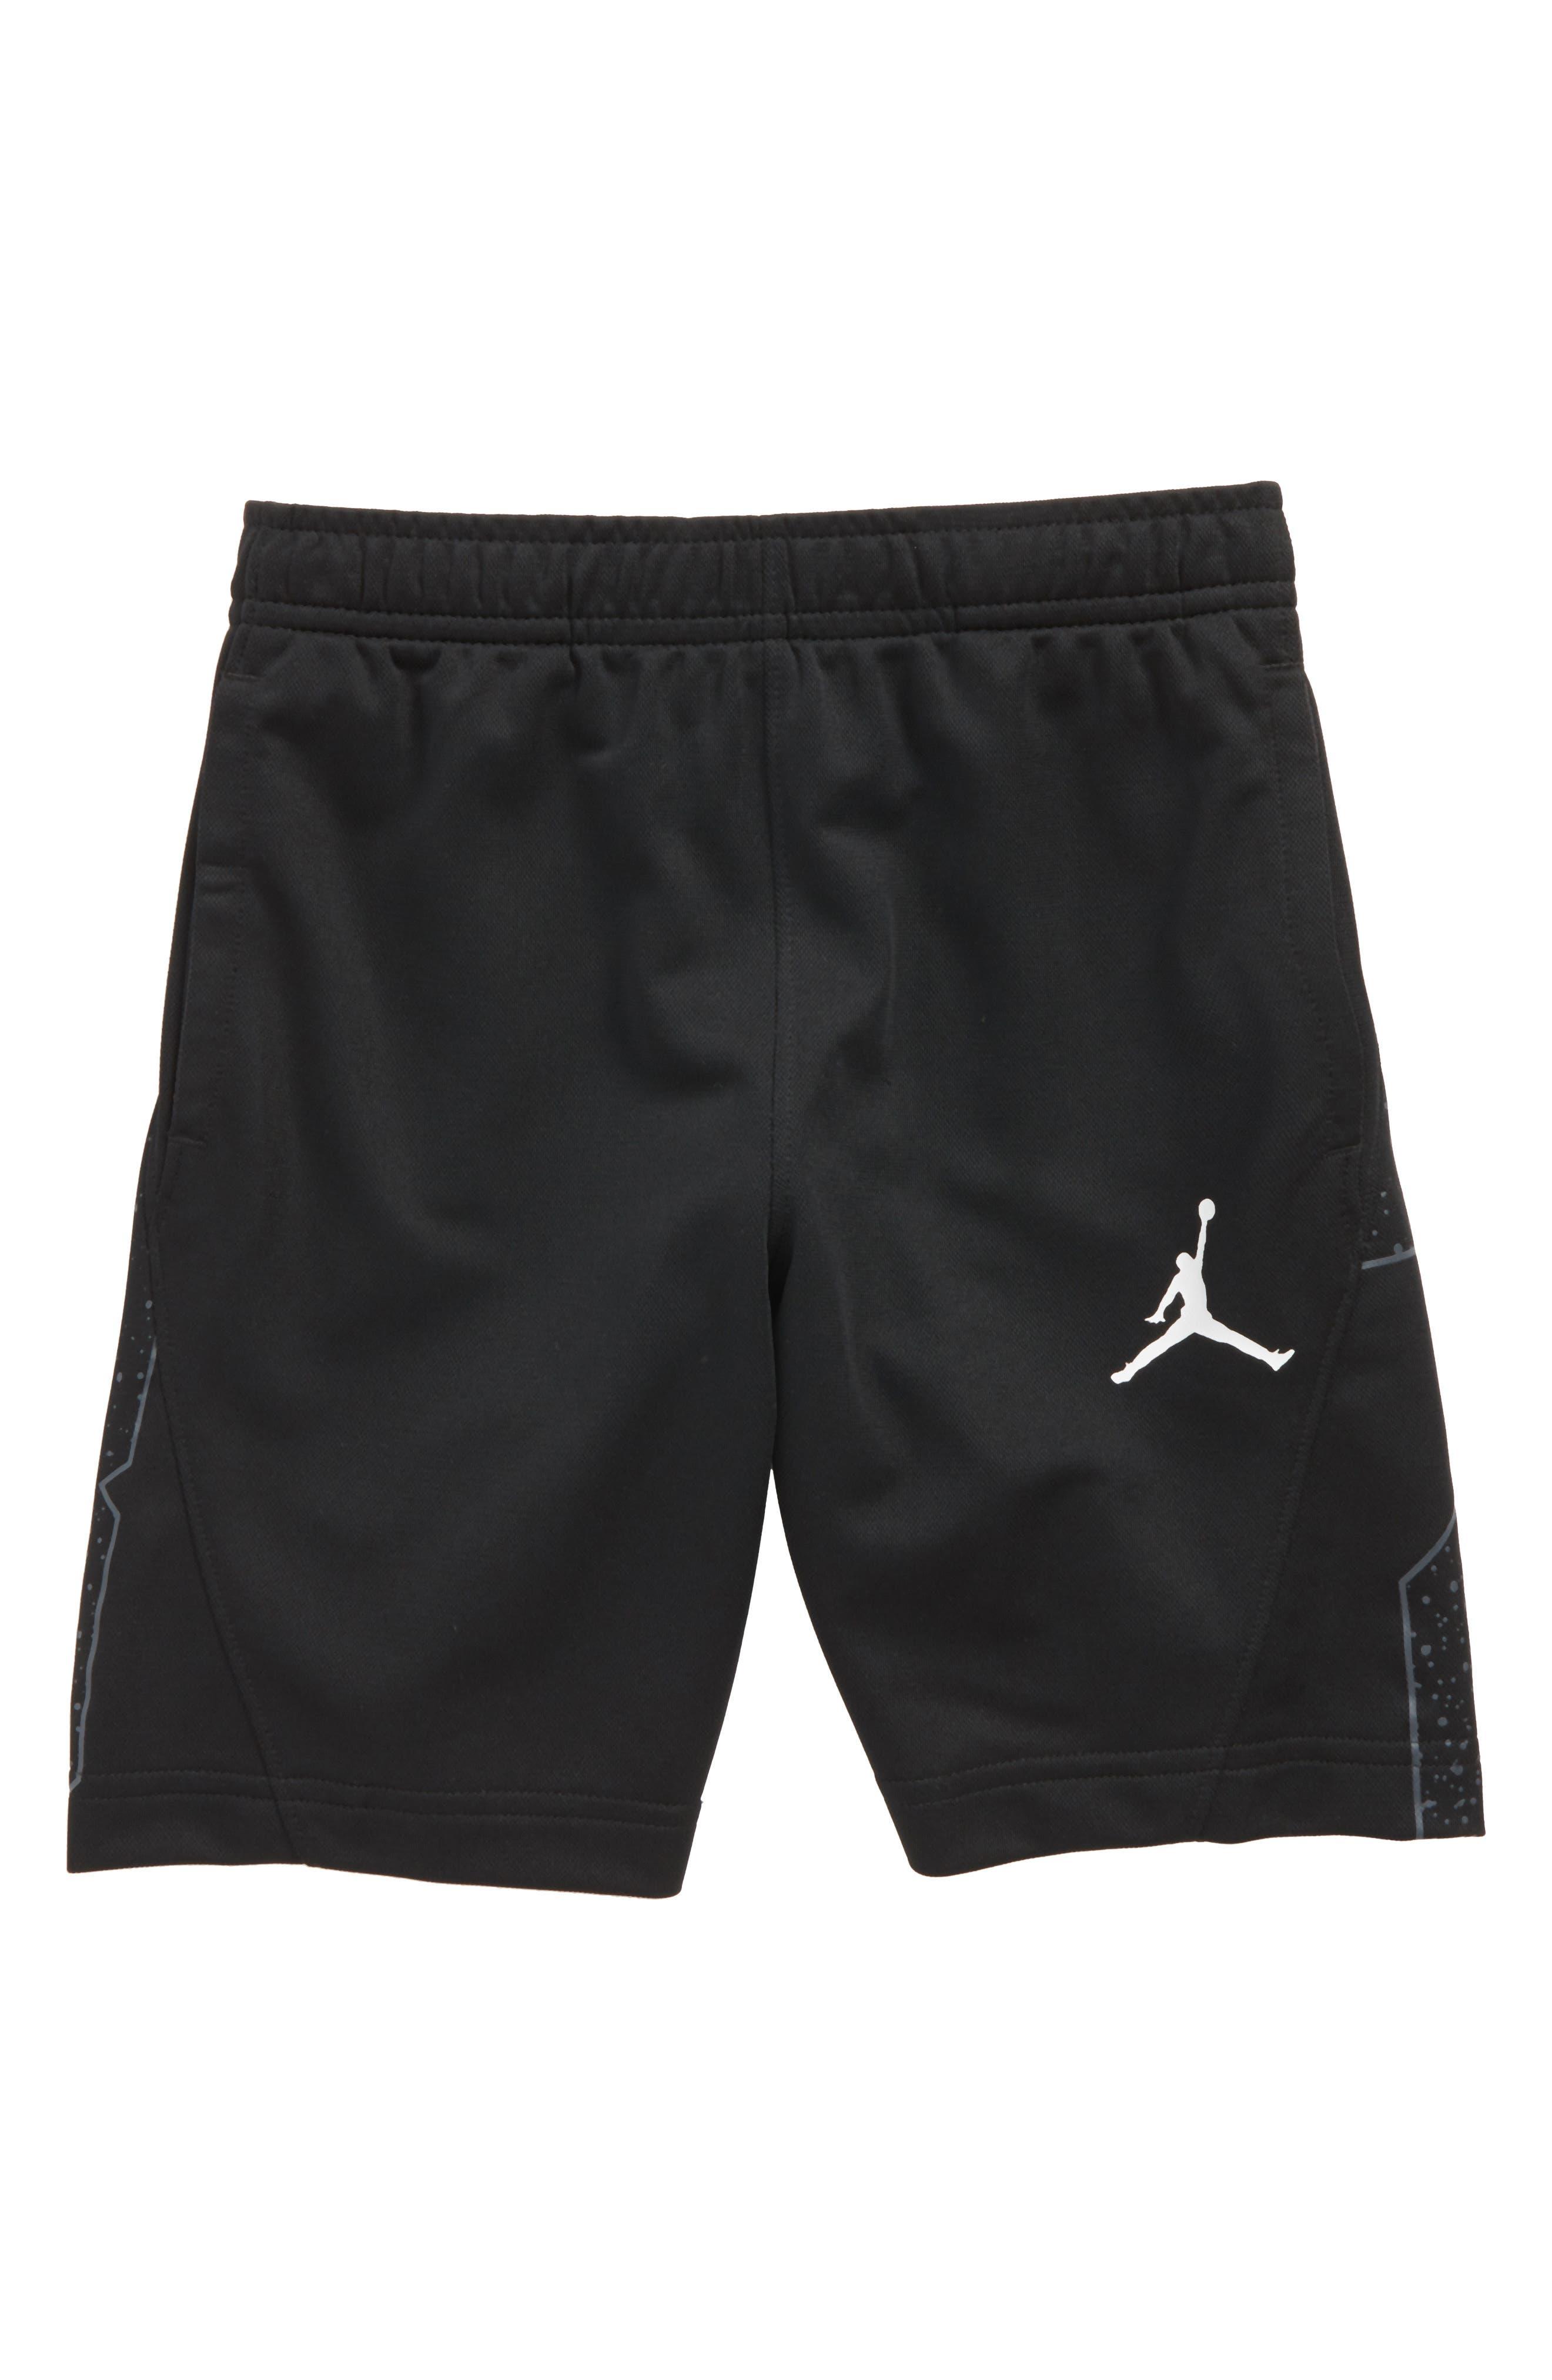 Jordan Dry Speckle 23 Training Shorts (Toddler Boys & Little Boys)